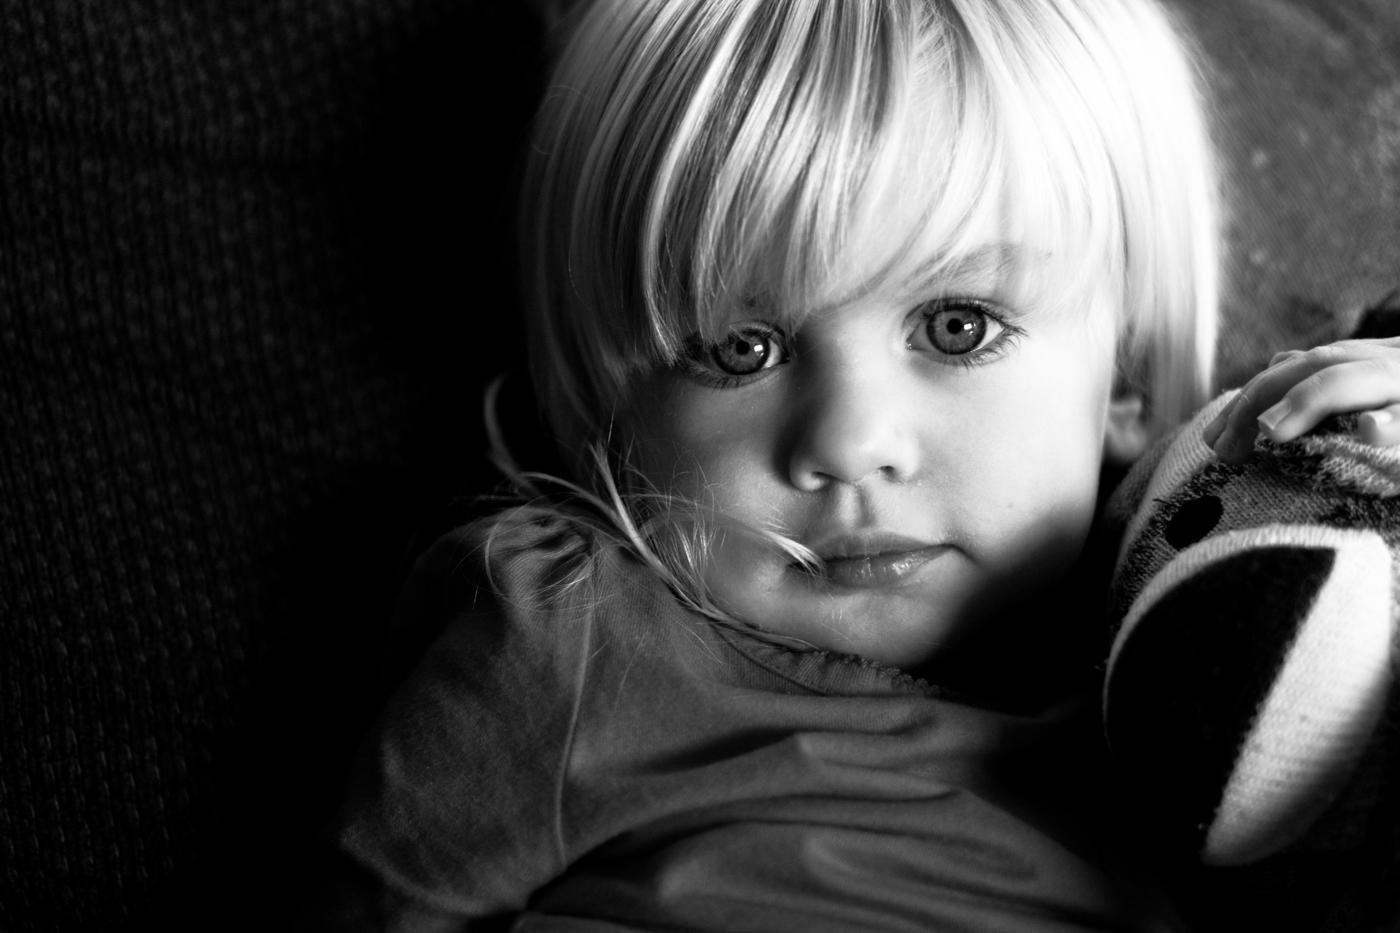 Gigis joy photography childrens portraits